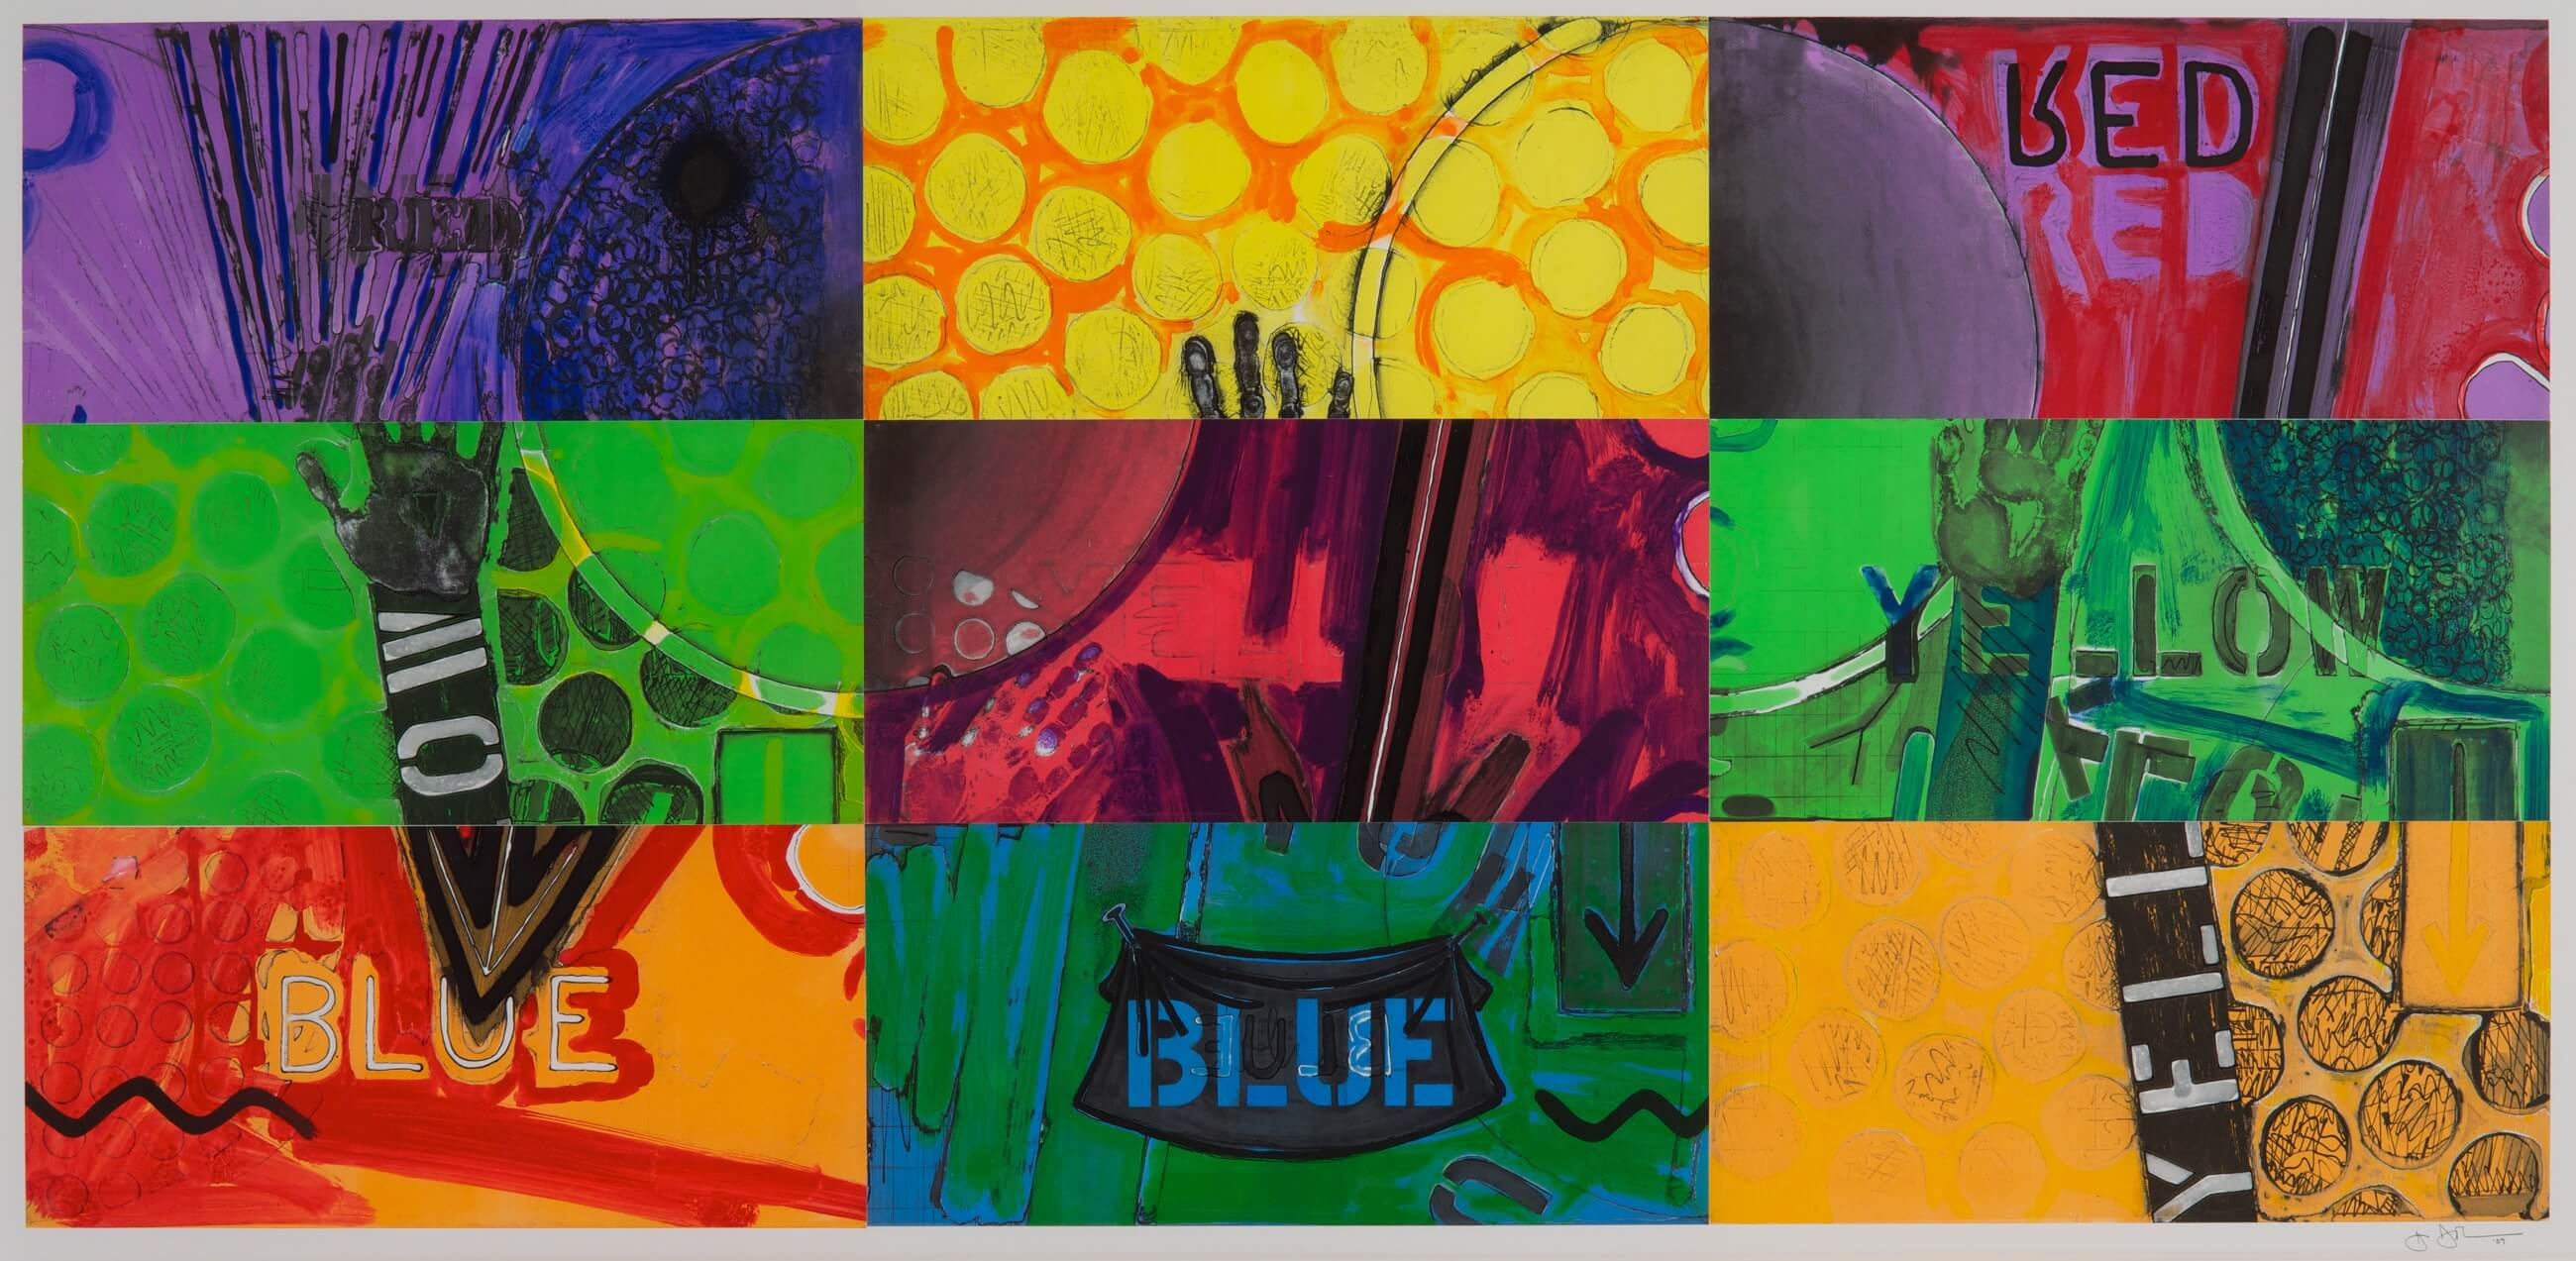 Untitled, 2014, by Jasper Johns